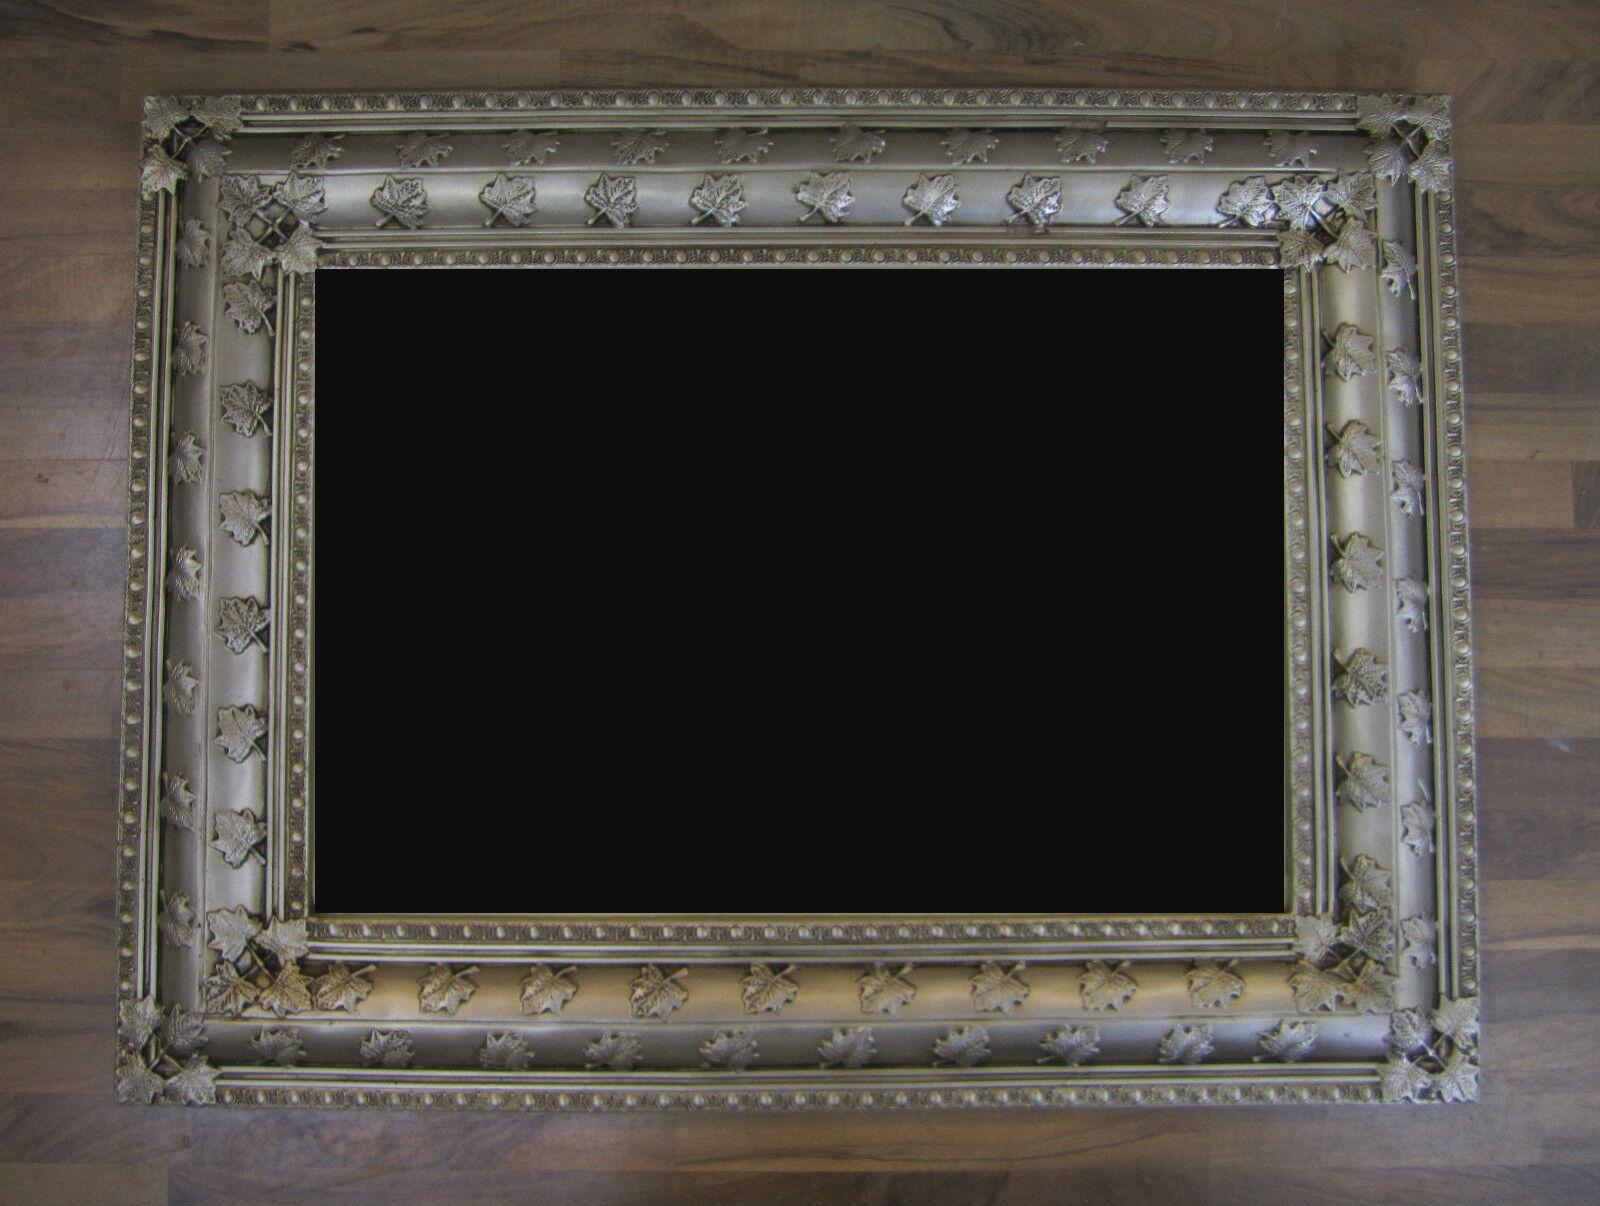 xxl wandspiegel luxuri s prunkvoll rechteckig barock und rokoko antik 122x92 cm ebay. Black Bedroom Furniture Sets. Home Design Ideas